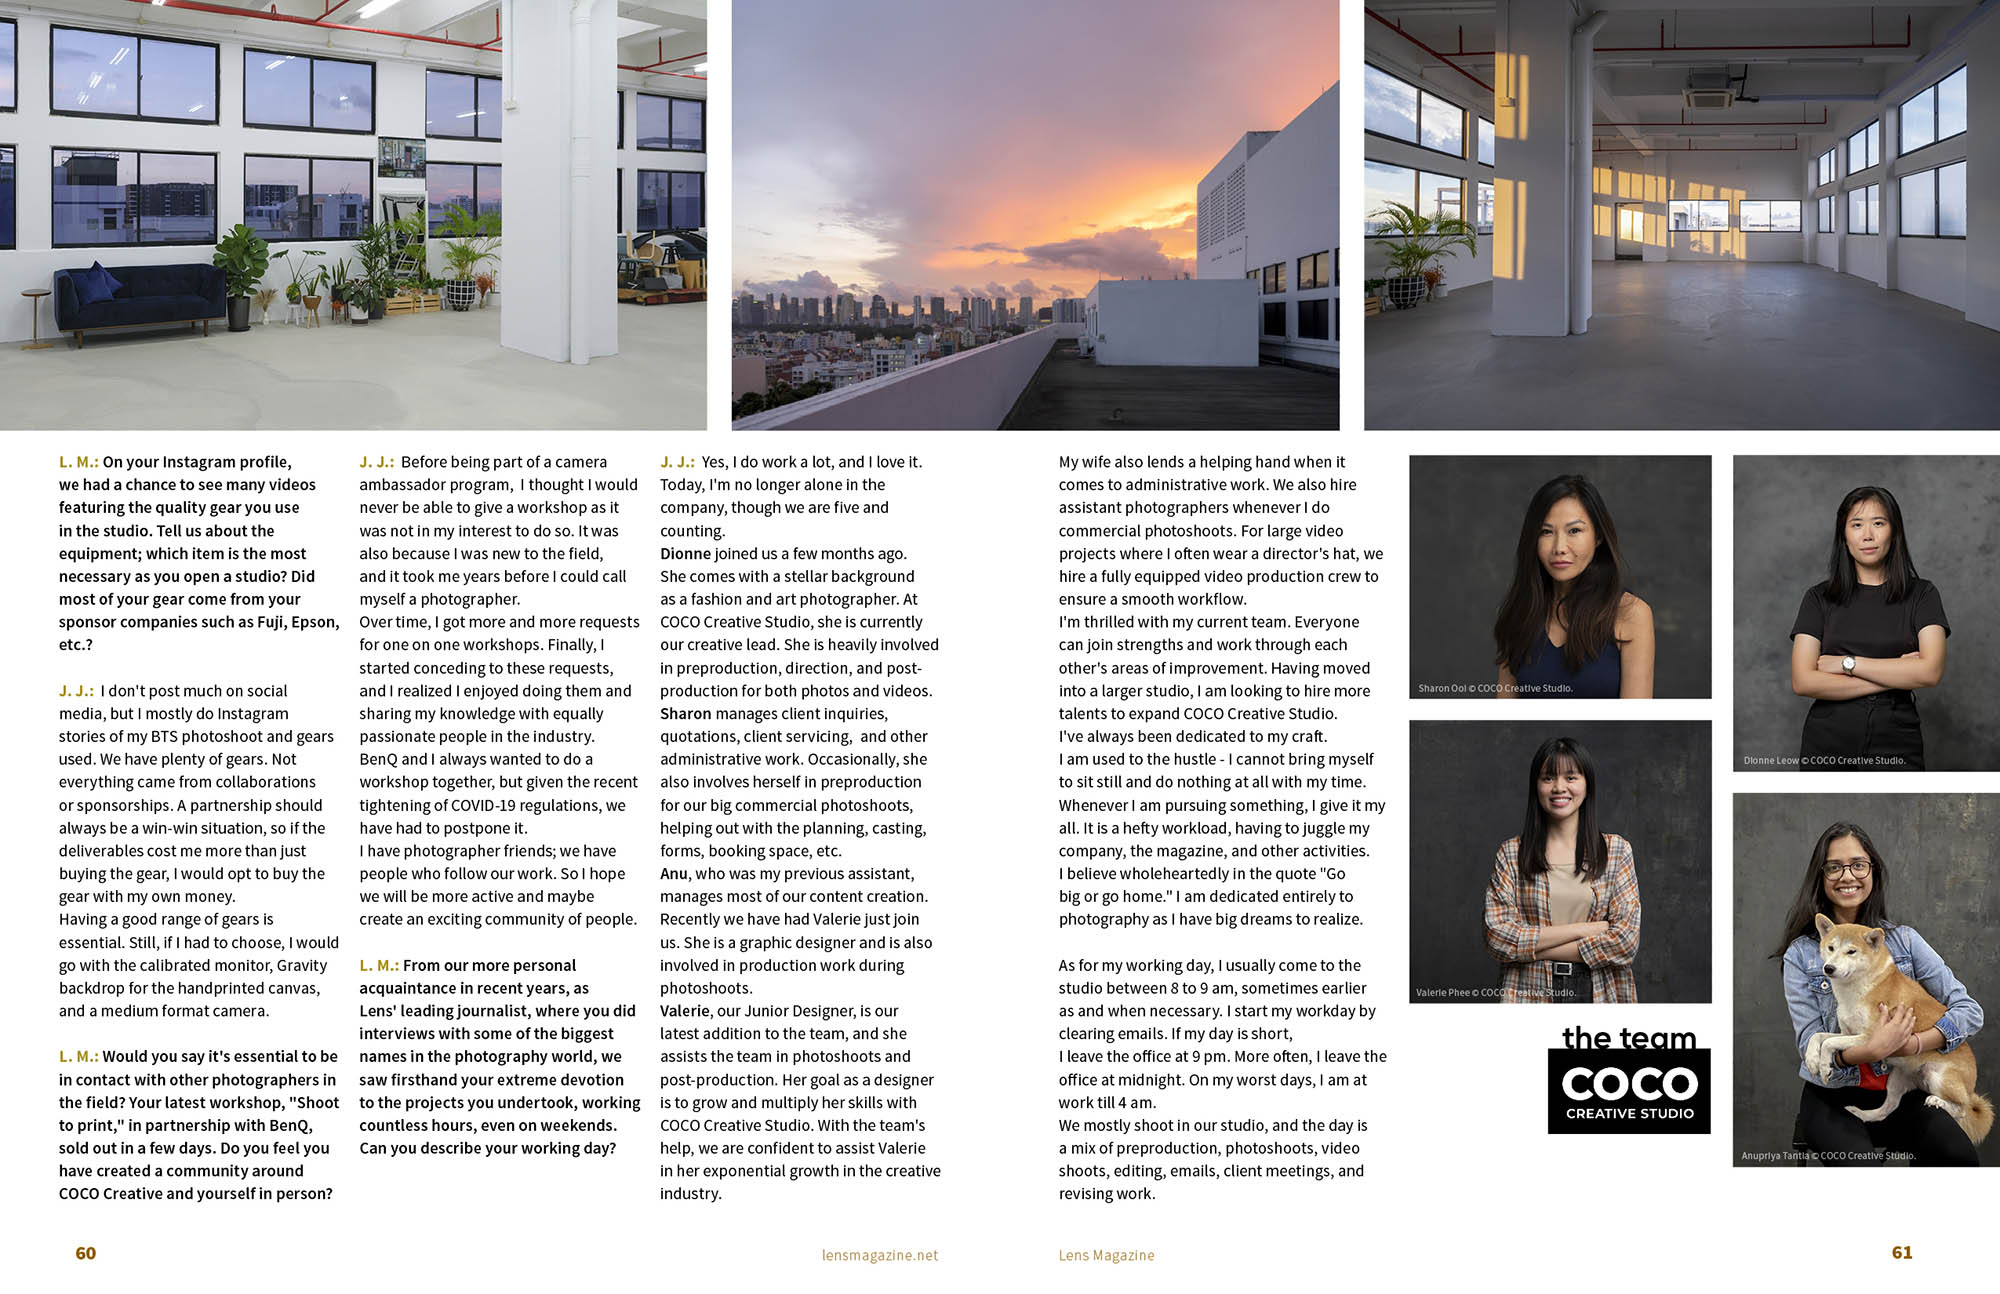 Lens Magazine Issue 83 COCO Creative Studio Photography Videography Services Singapore Jose Jeuland 5